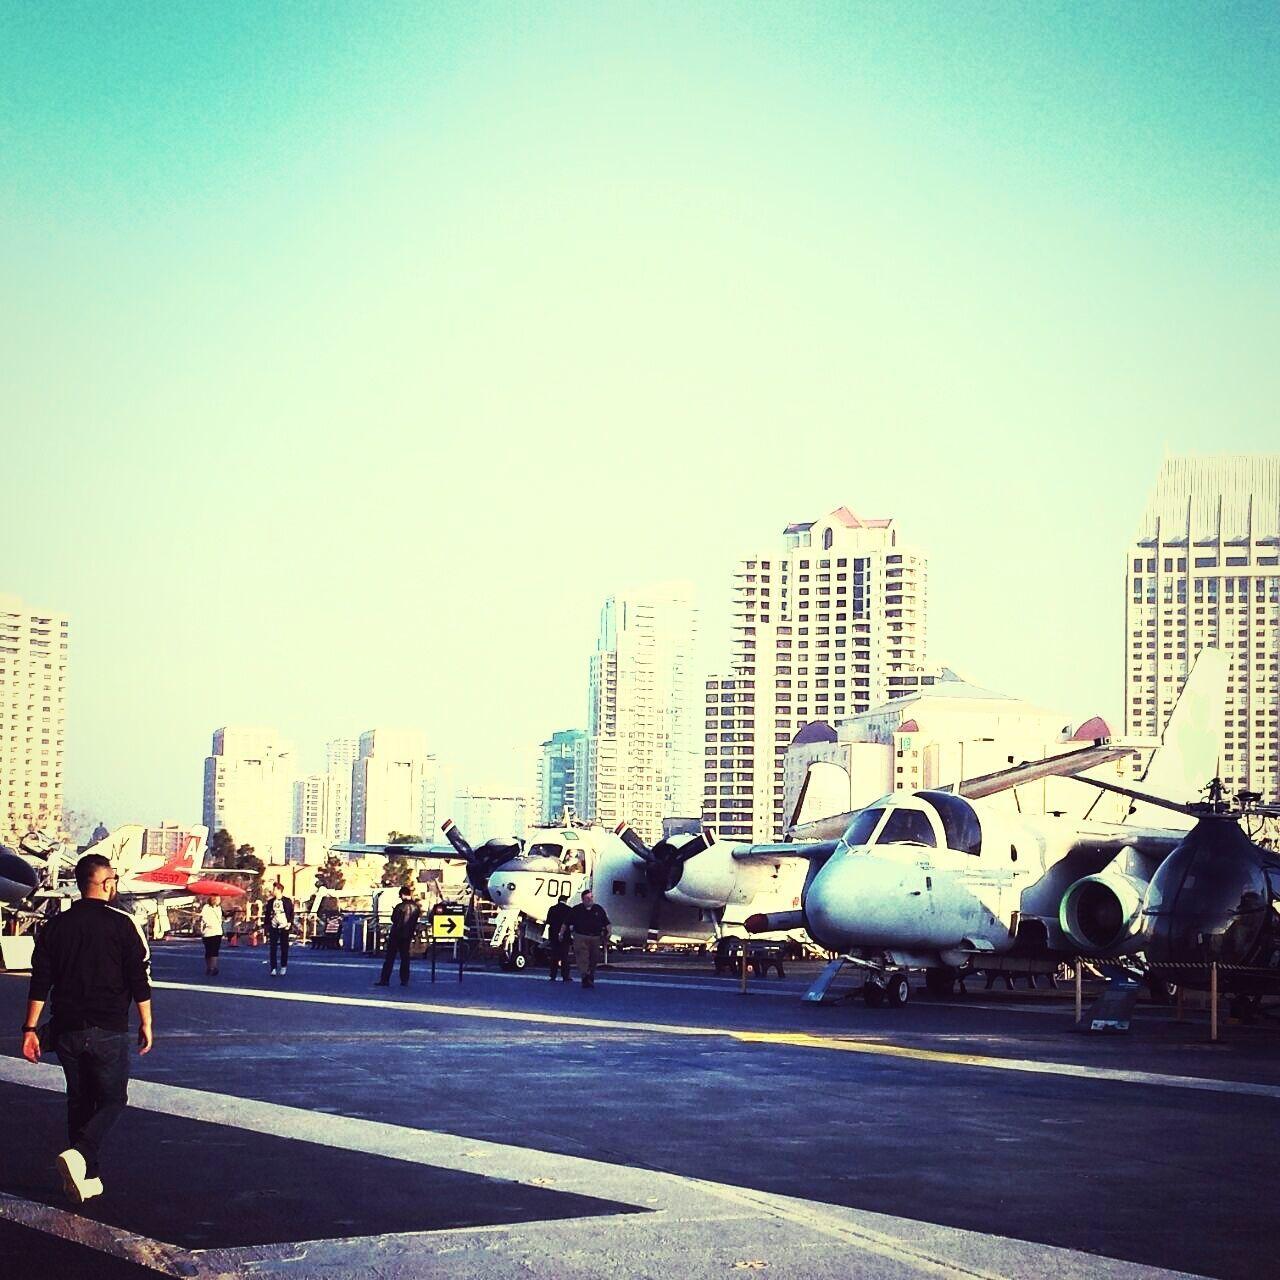 Viewfromussmidway Letsfly Topgun Navyseal vamos a volar un rato...